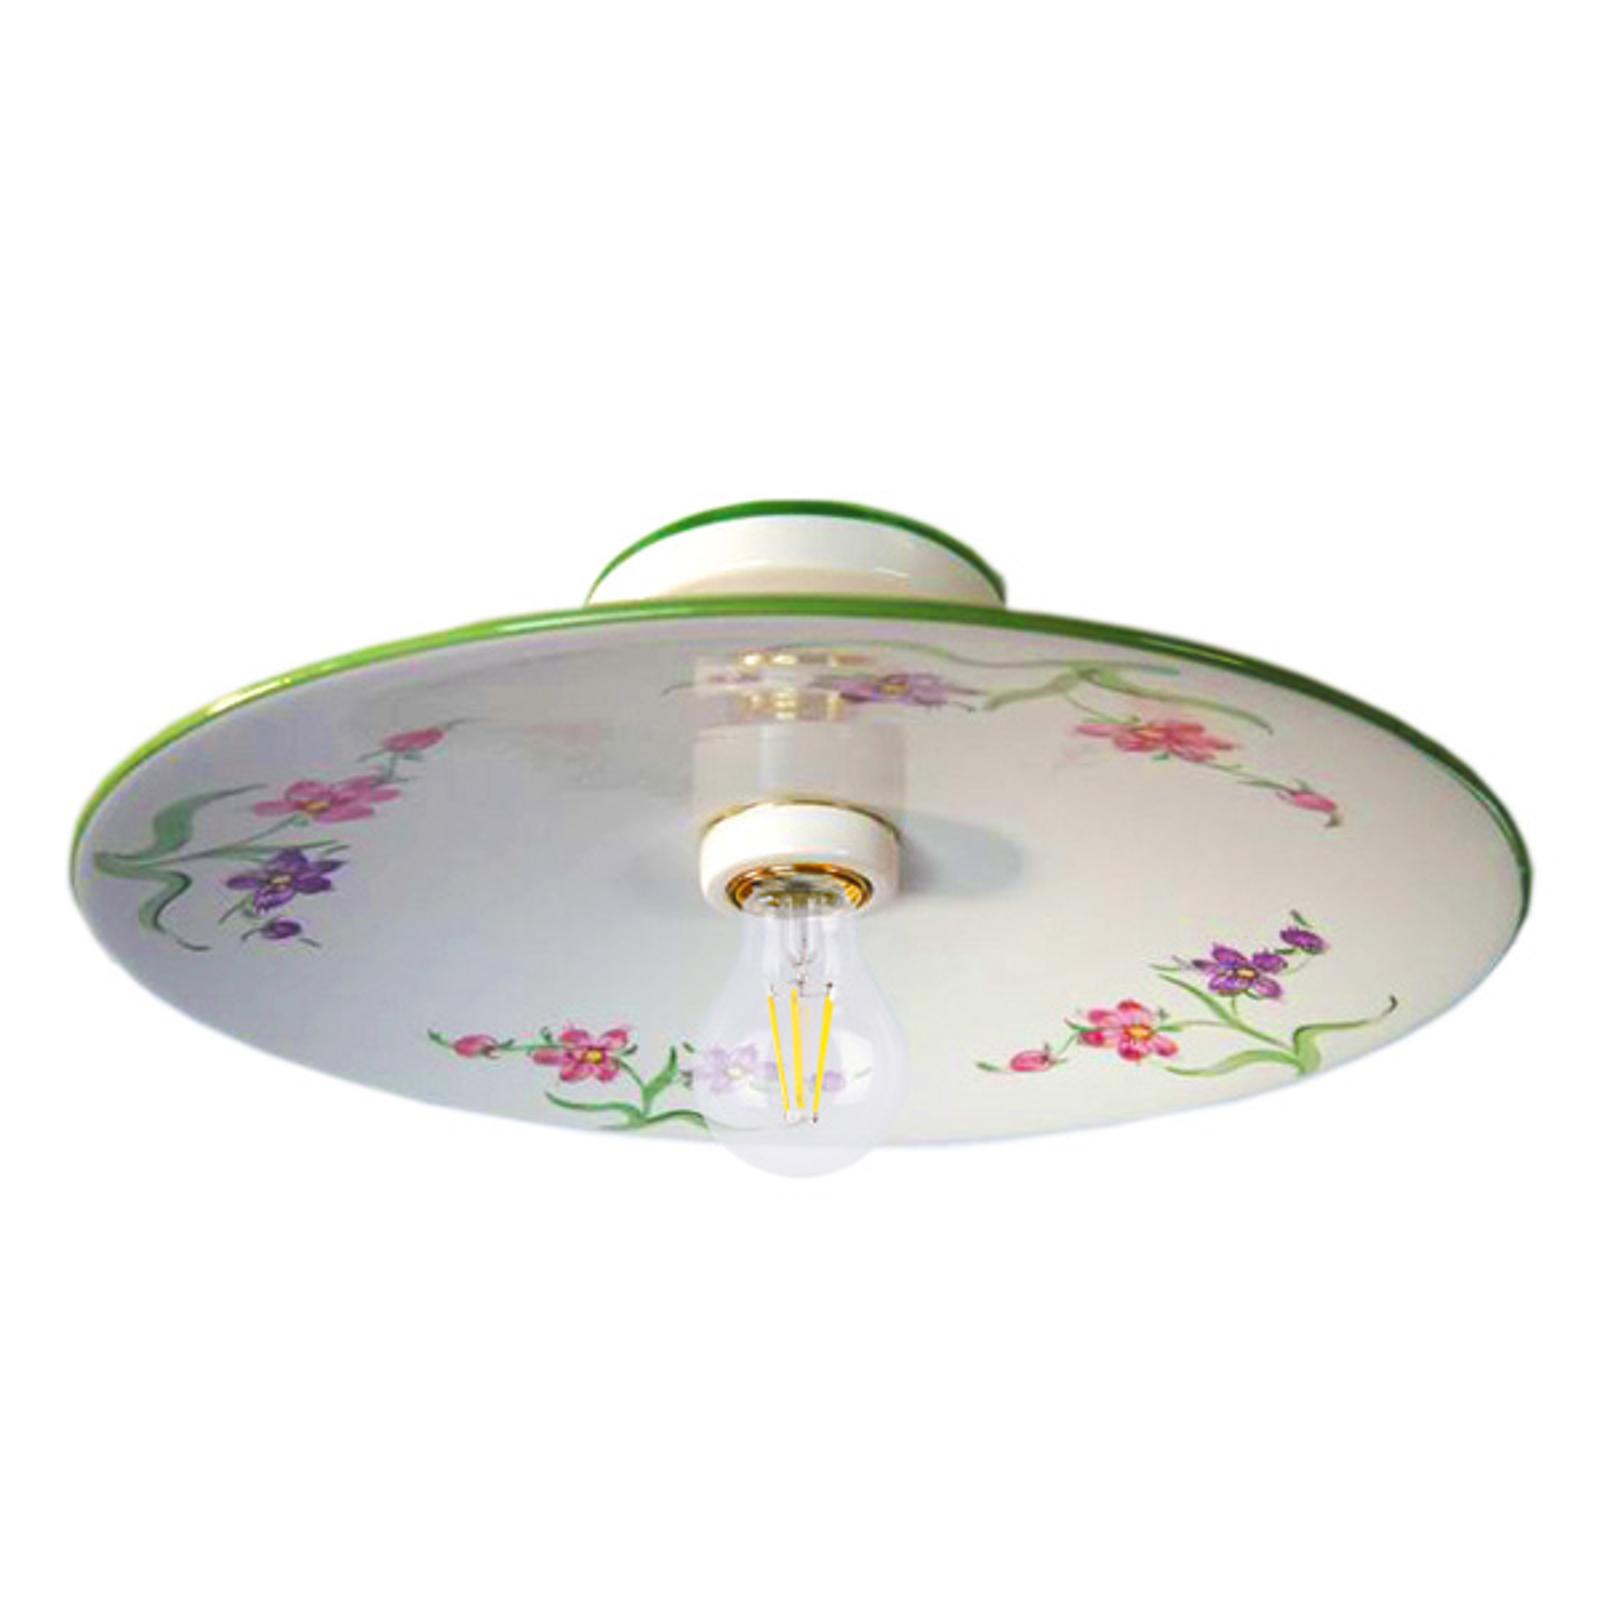 Loftlampe i keramik Ambra, i landlig stil